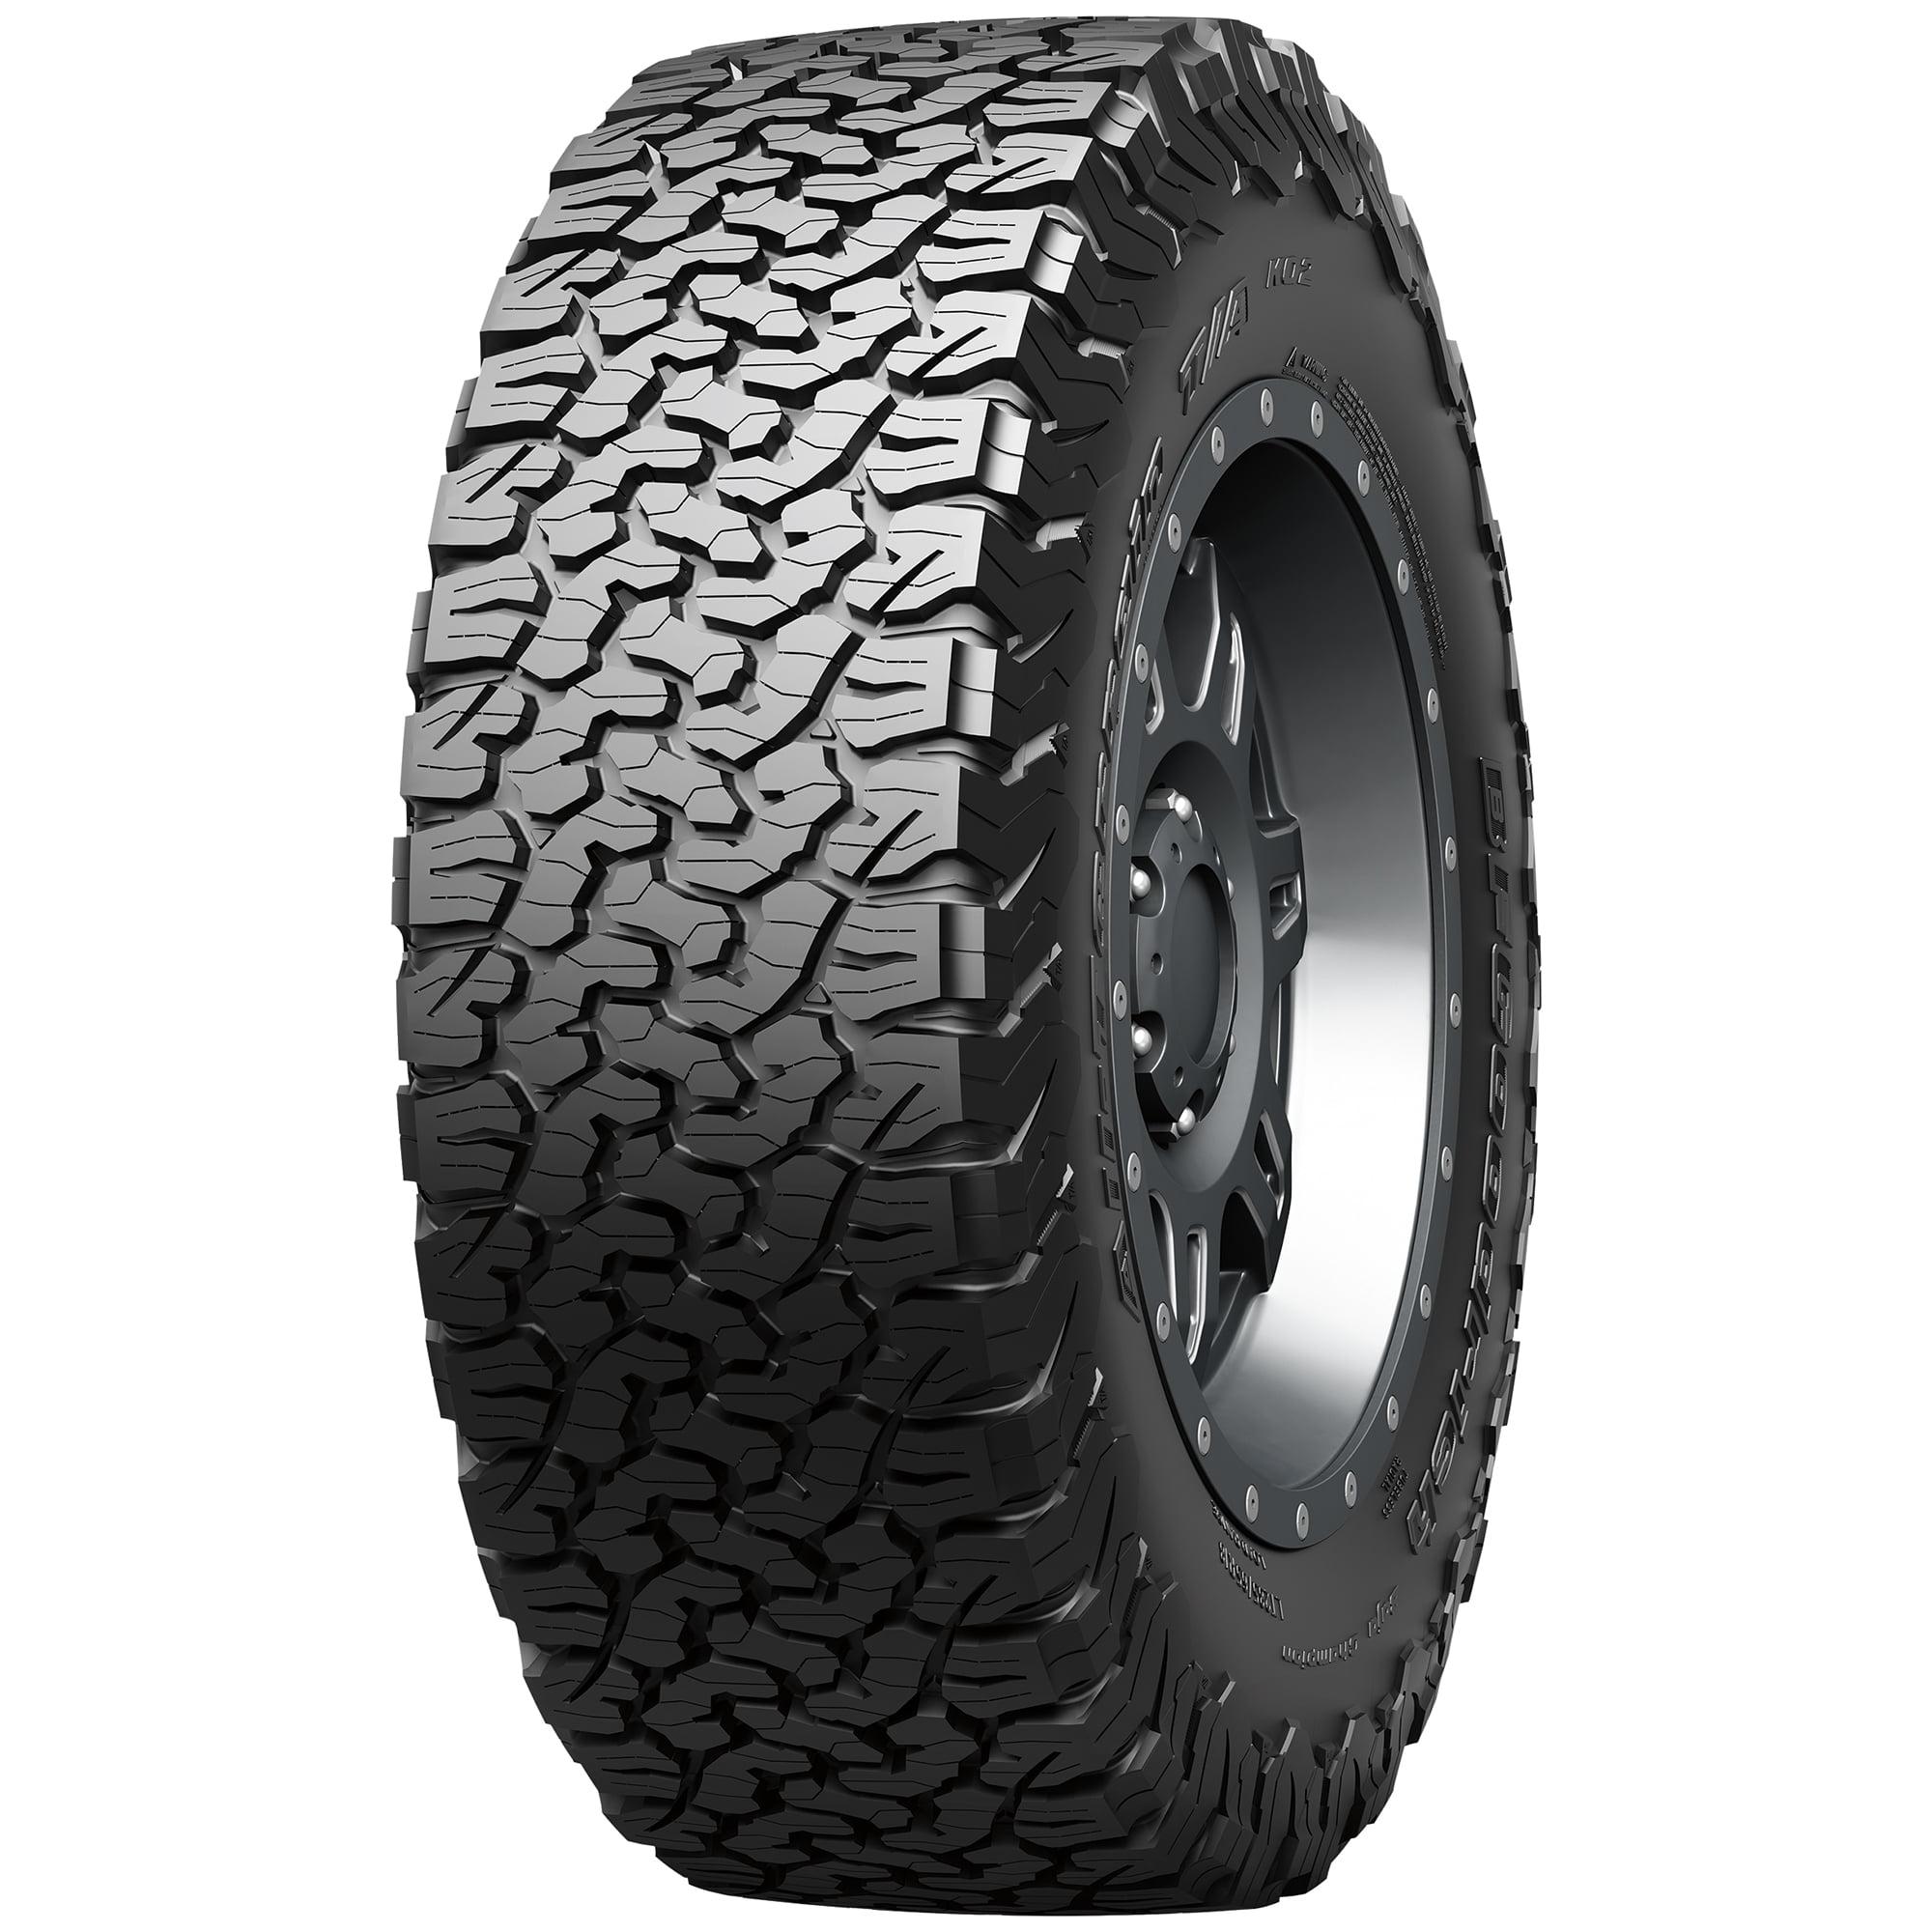 BFGoodrich All-Terrain T/A KO2 Tire LT255/75R17/C 111/108S